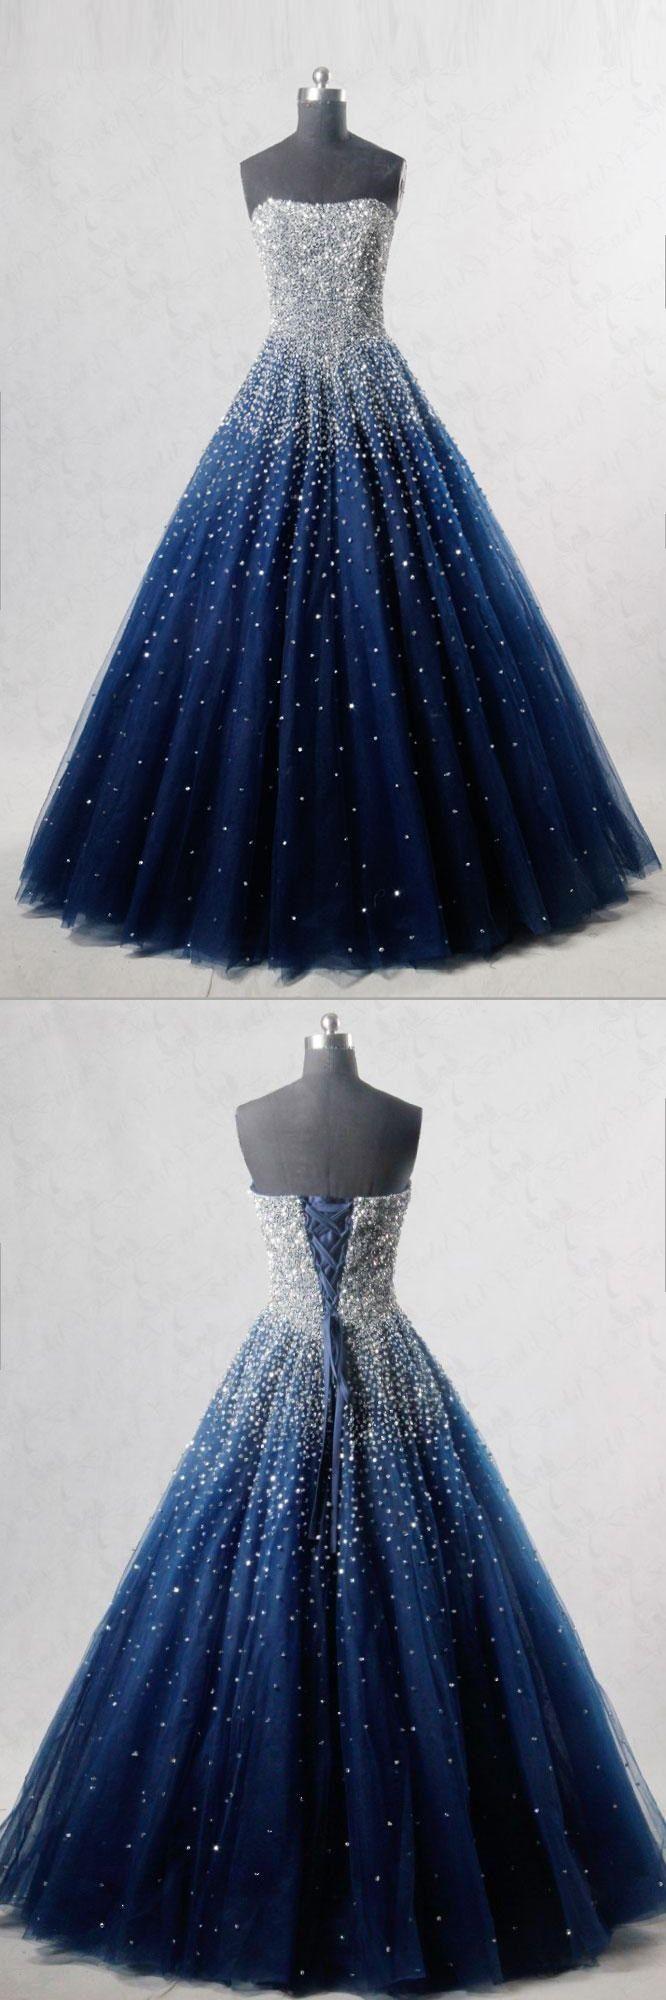 Blue sweetheart sequin tulle long prom dress blue evening dress